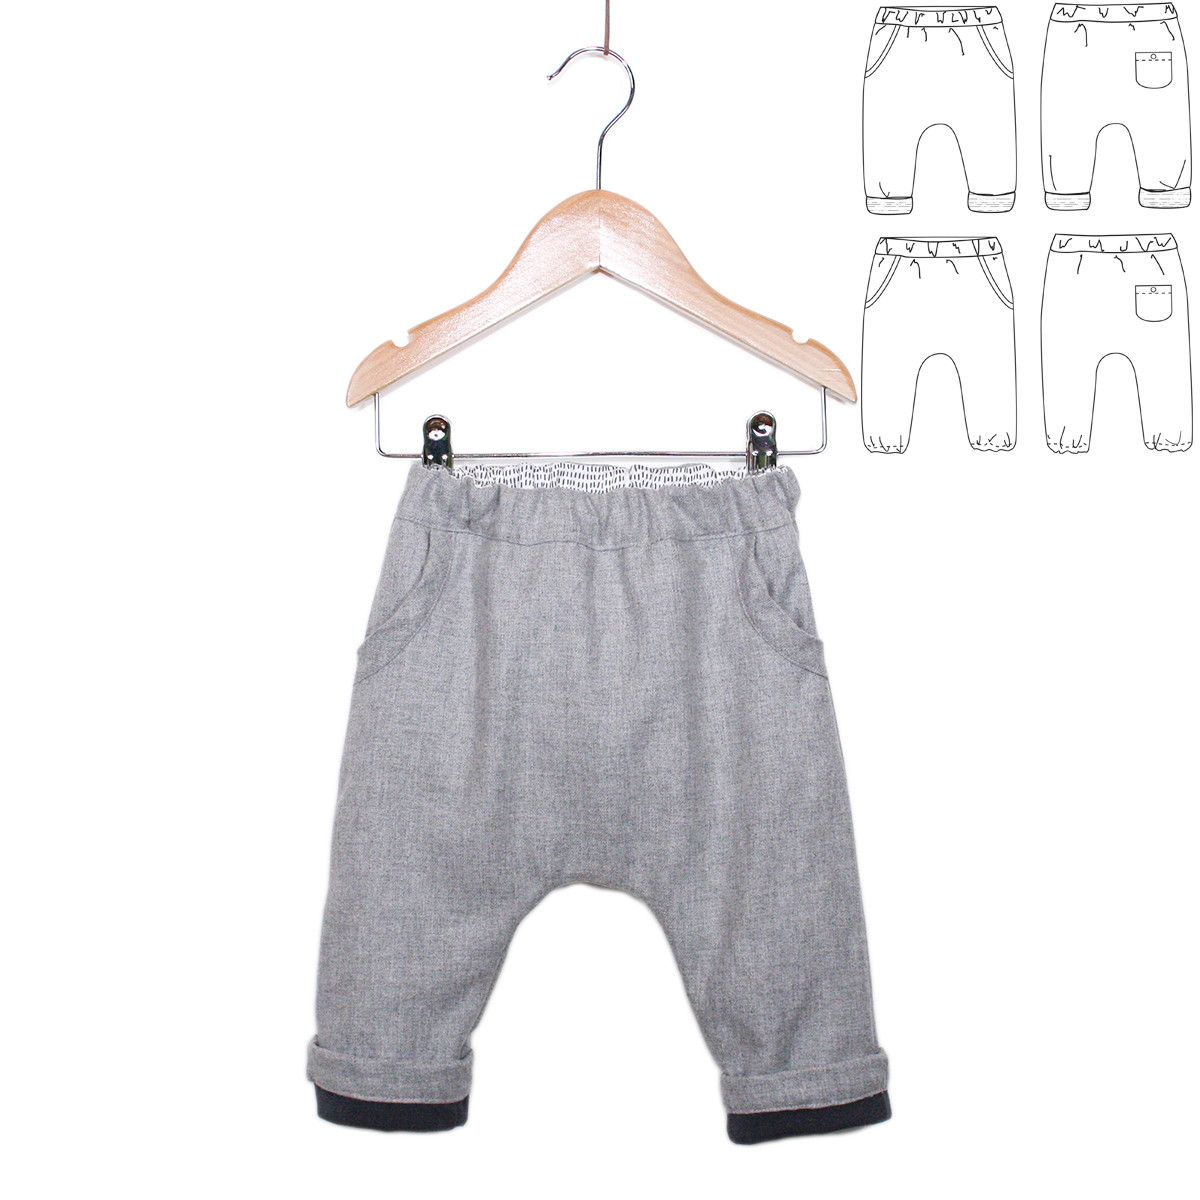 Sevilla unisex harem pants - Baby 1M/4Y - PDF Sewing Pattern